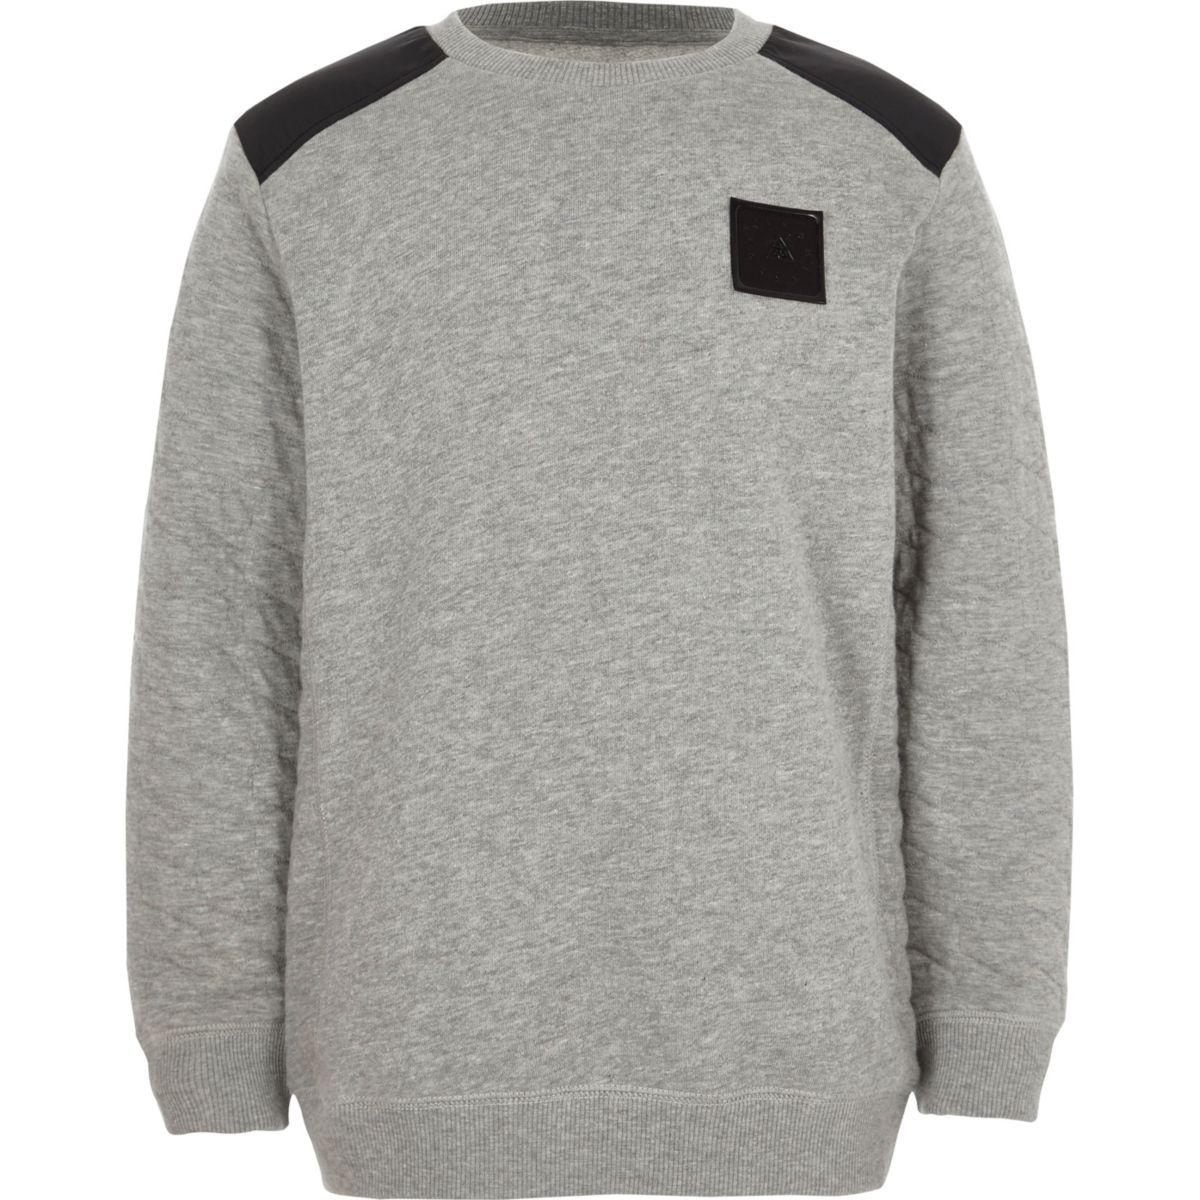 Boys grey quilted sleeve sweatshirt